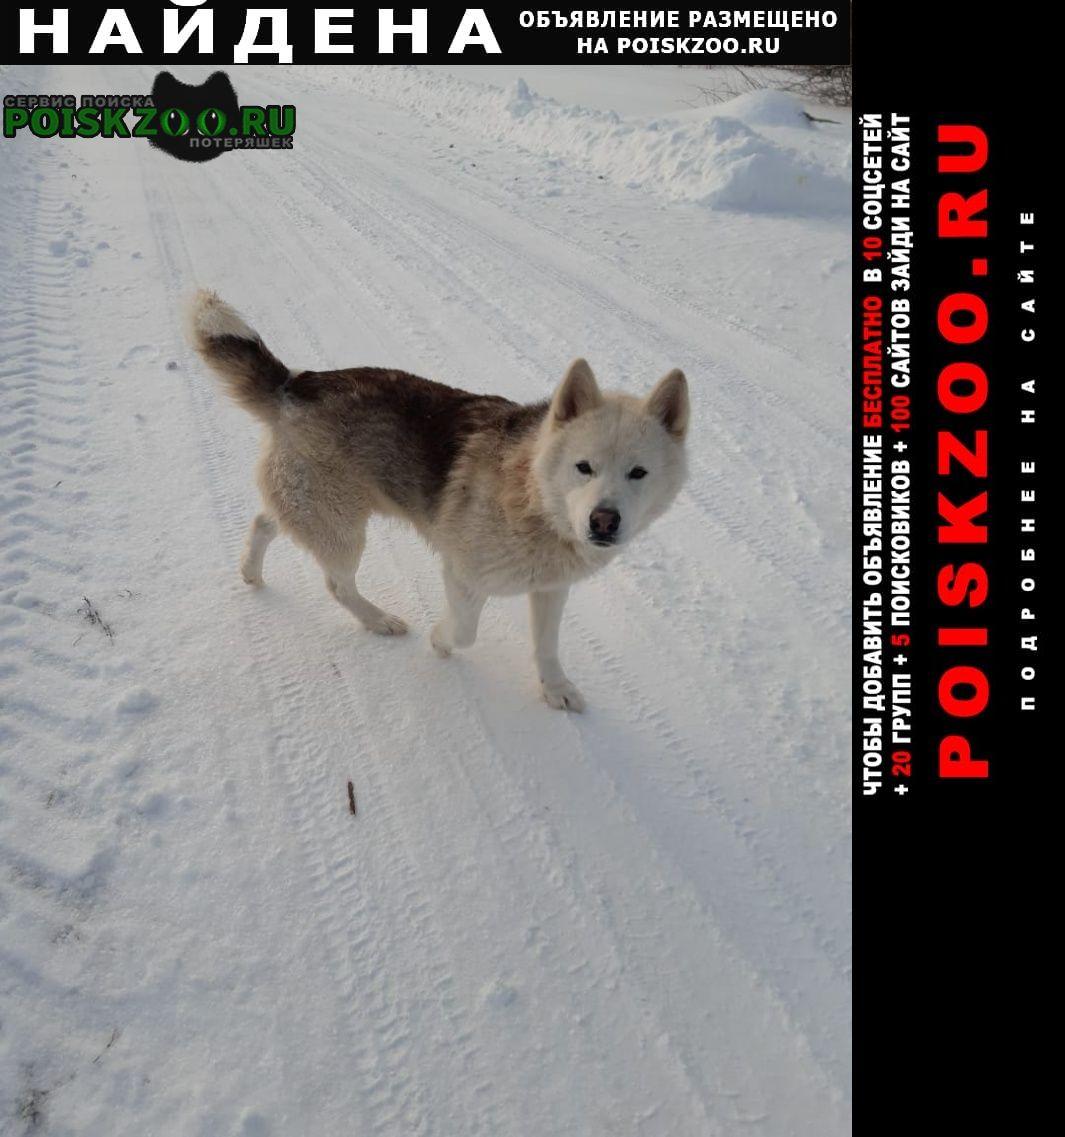 Найдена собака д. матвейково, ступинский район Ступино